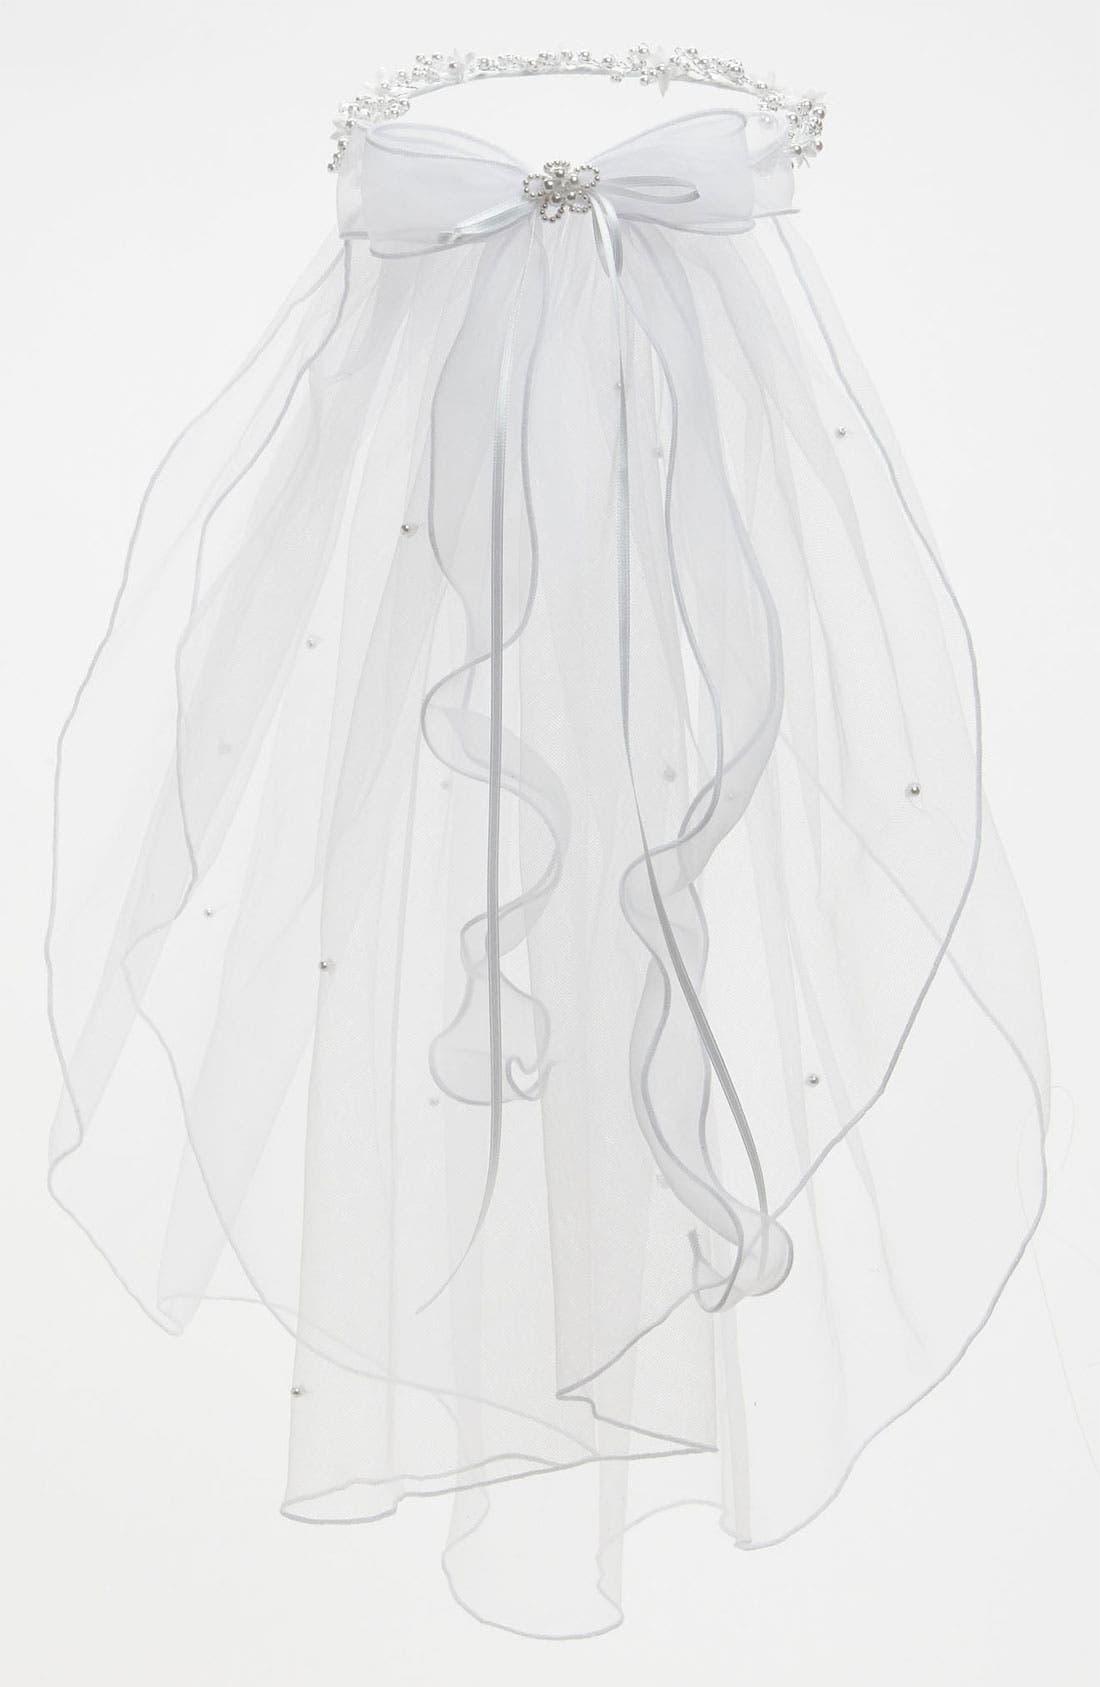 Main Image - Lauren Marie Beaded Wreath & Veil (Girls)